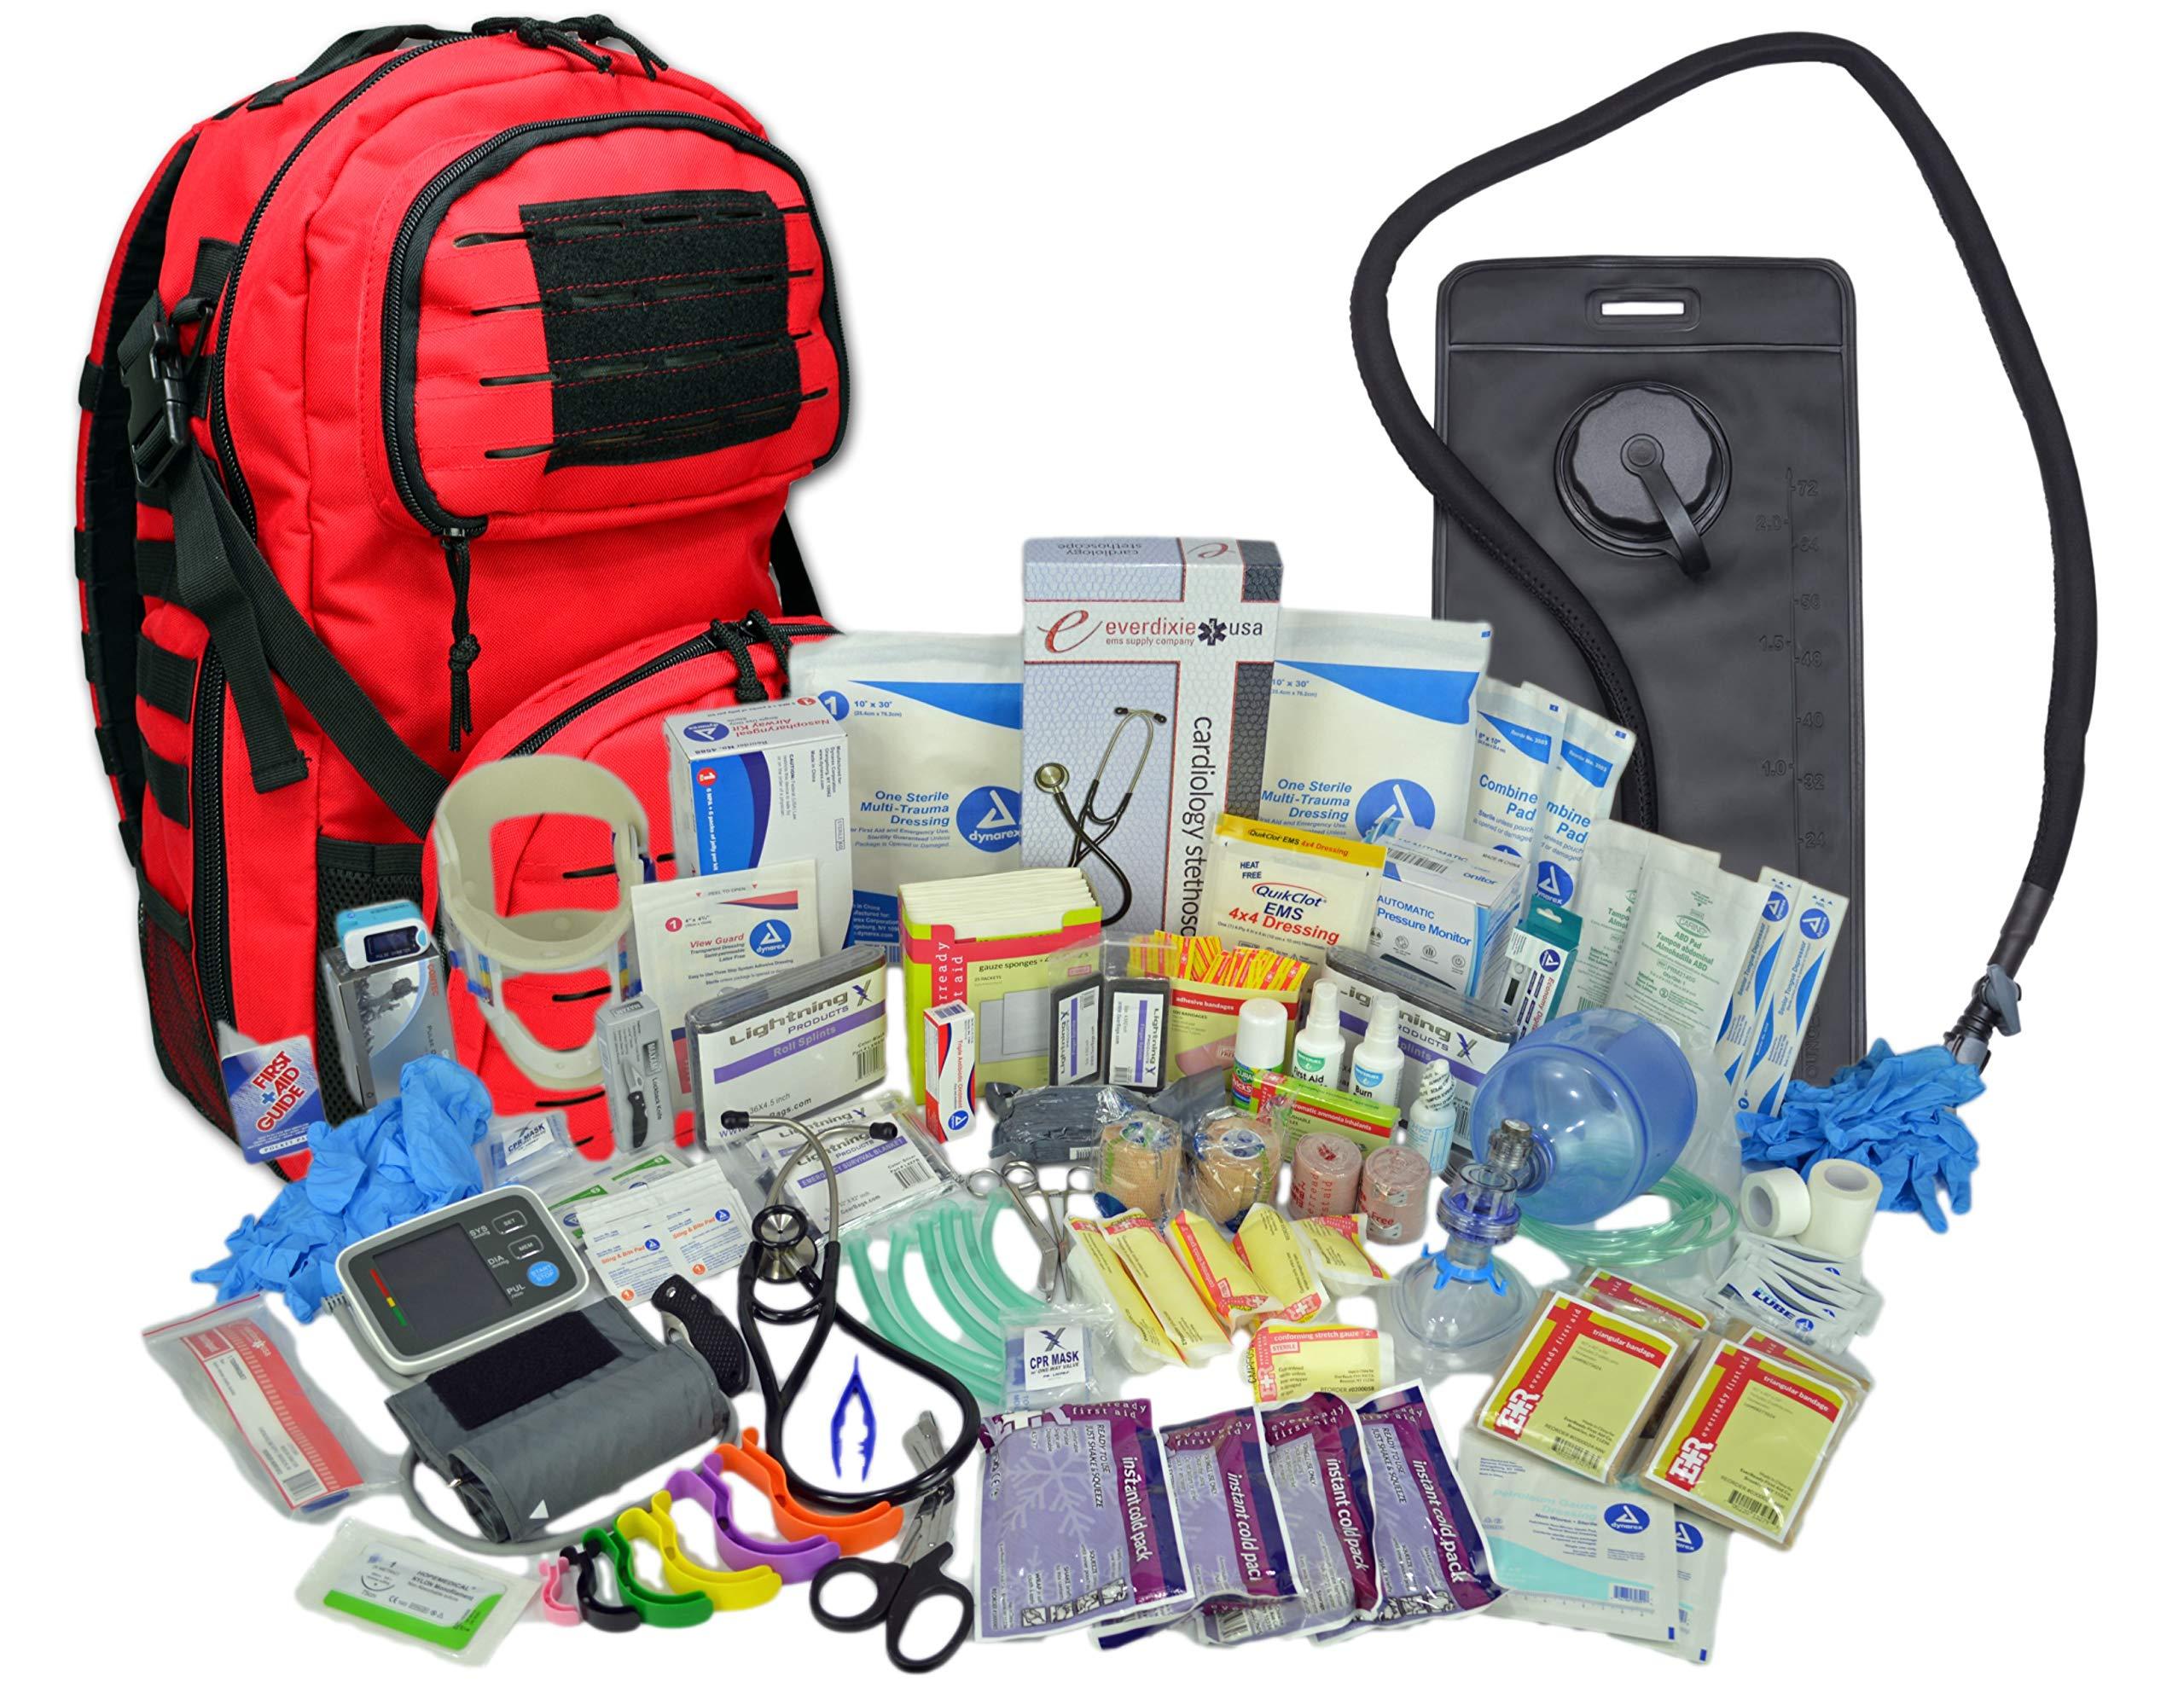 Lightning X Premium Stocked Tactical EMS/EMT Trauma First Aid Responder Medical Kit Backpack (Red w/Hydration Bladder)